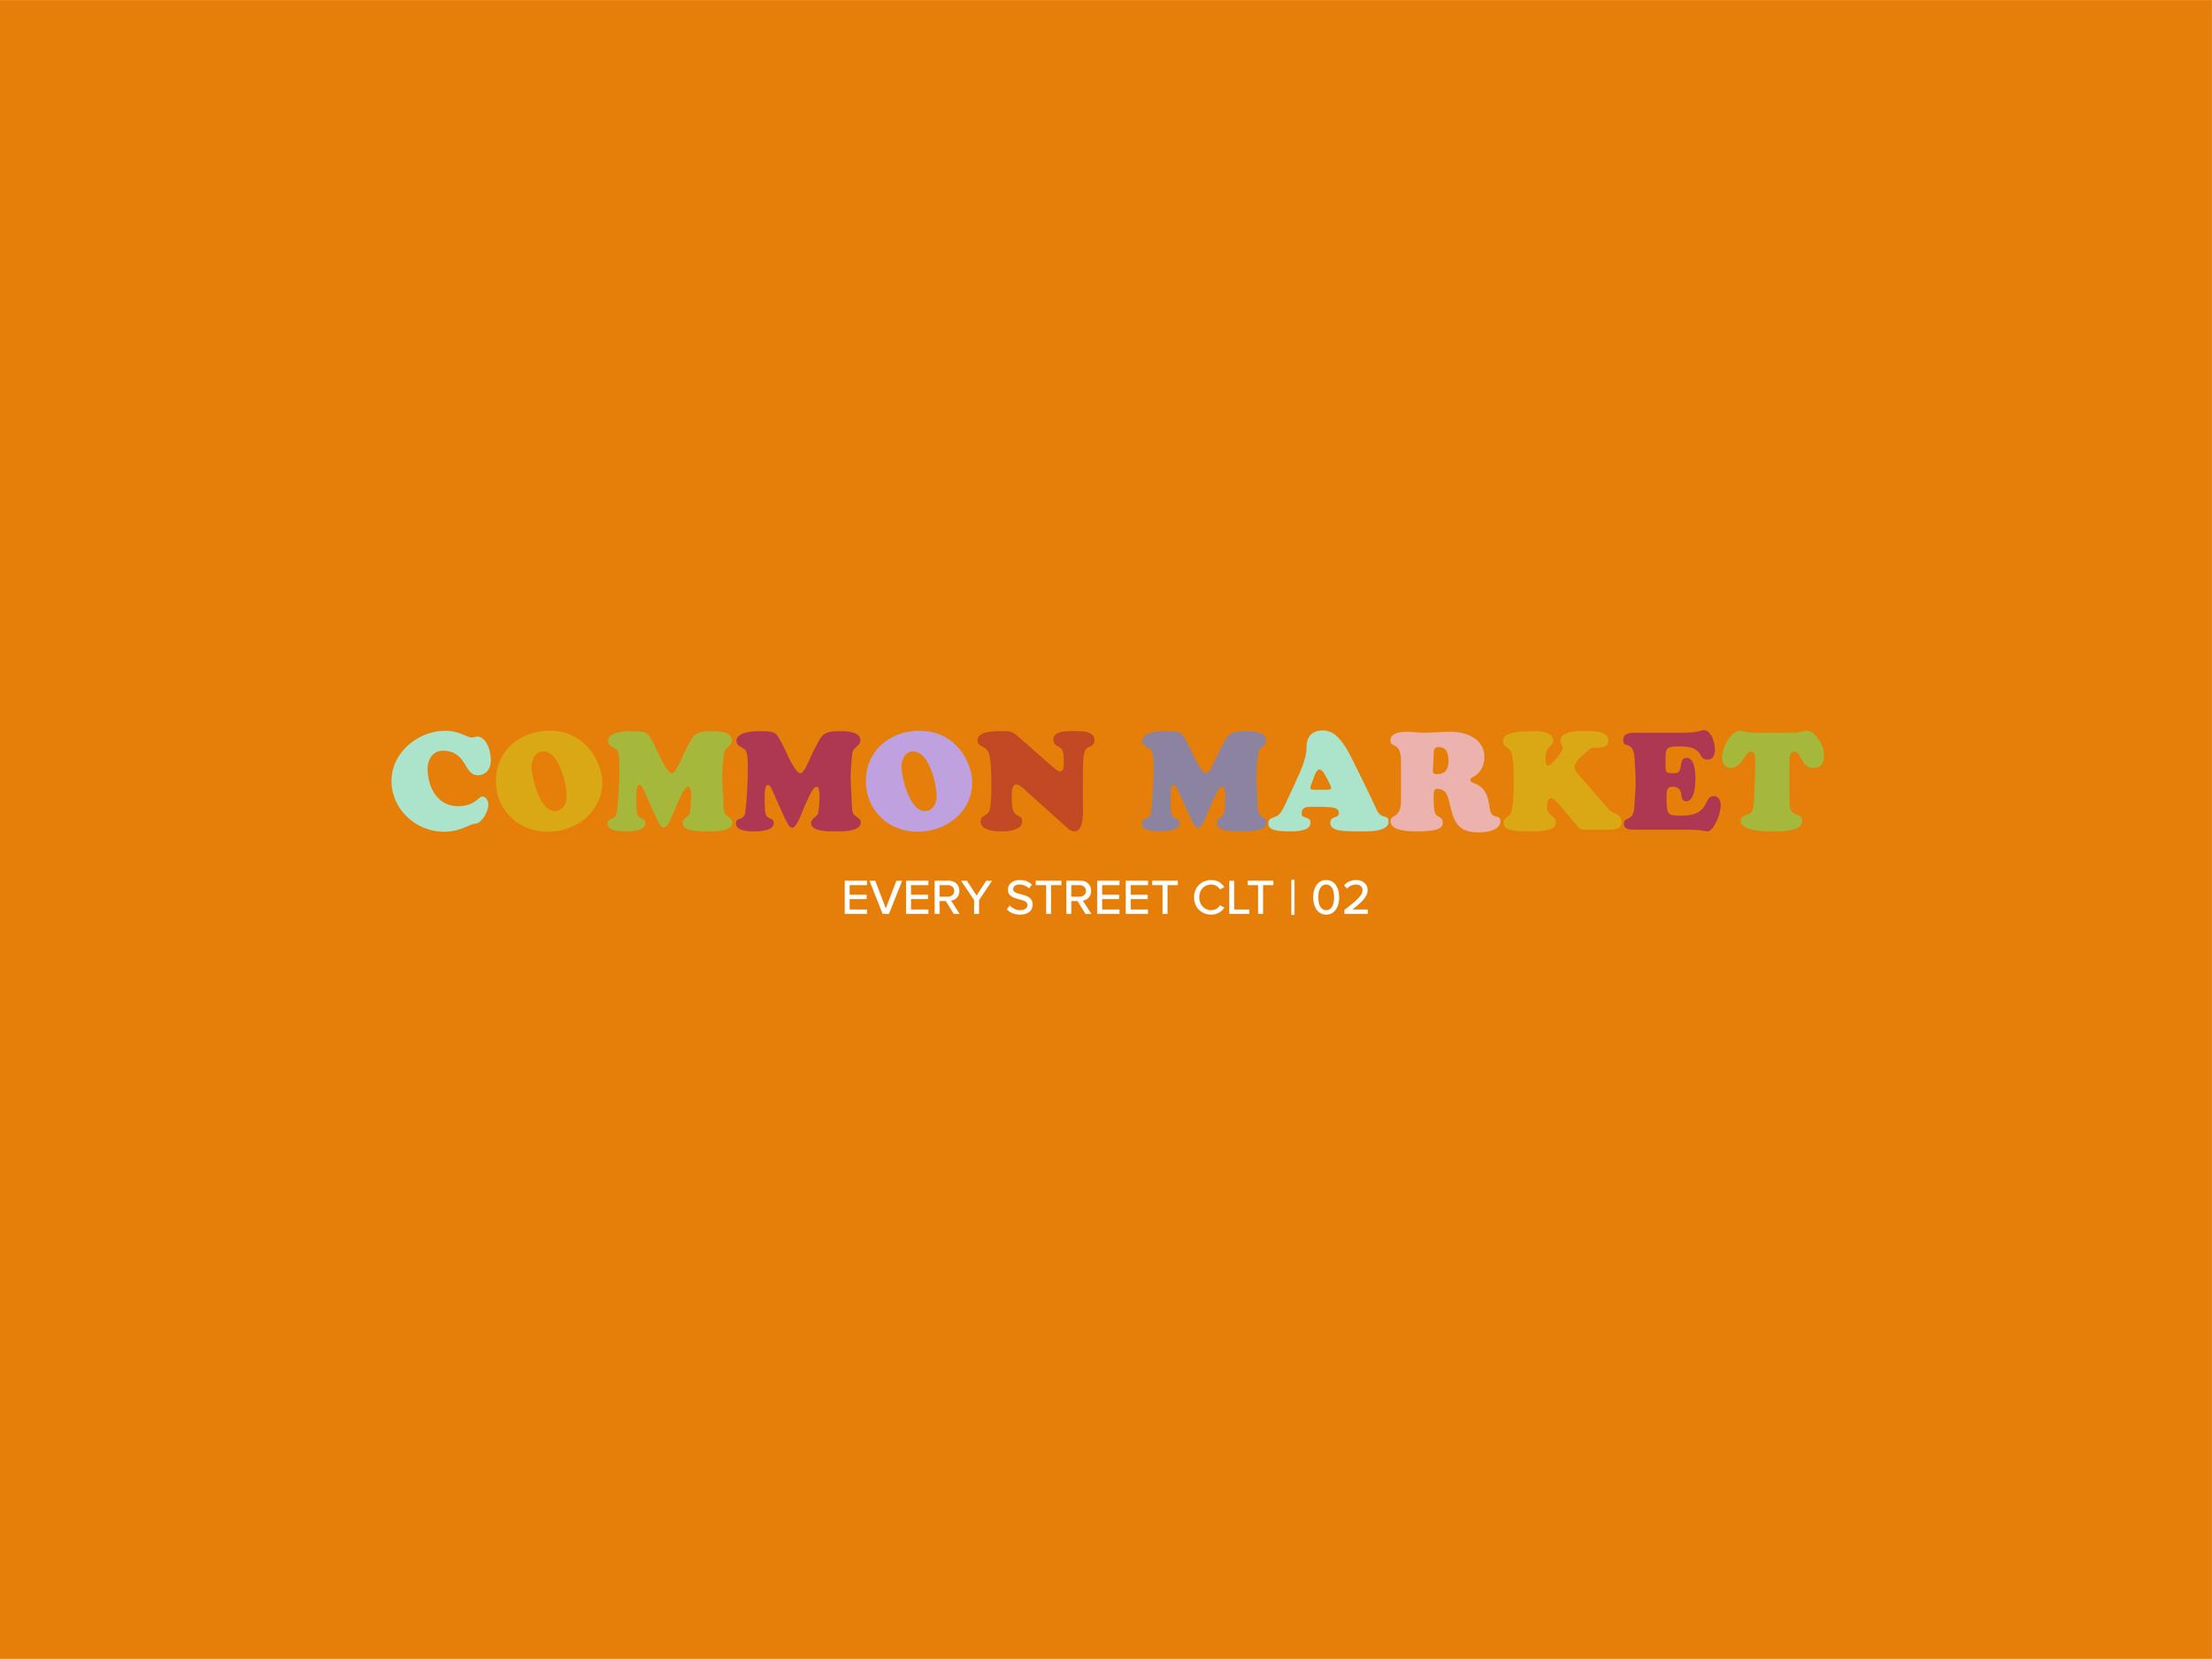 TCH_Blog_COMMON MARKET.png